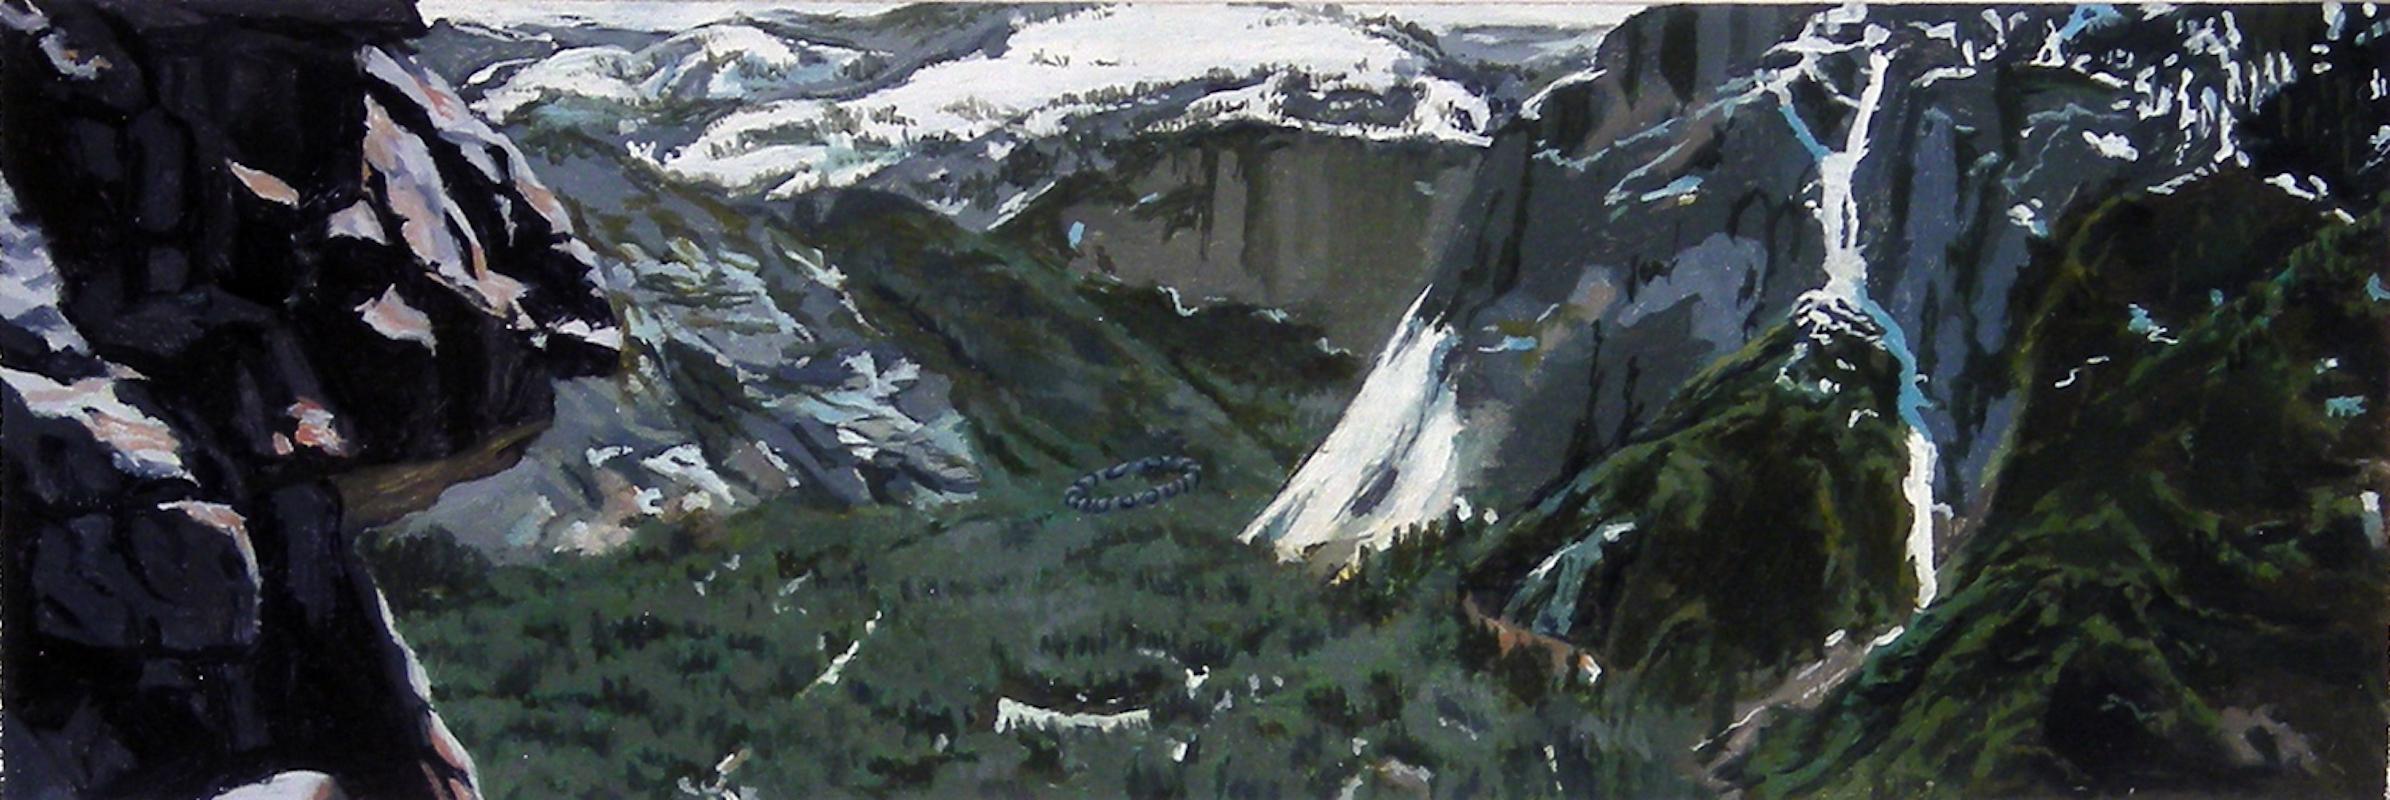 Steve Cope, Rock Yosemite, Oil on Panel, 2012